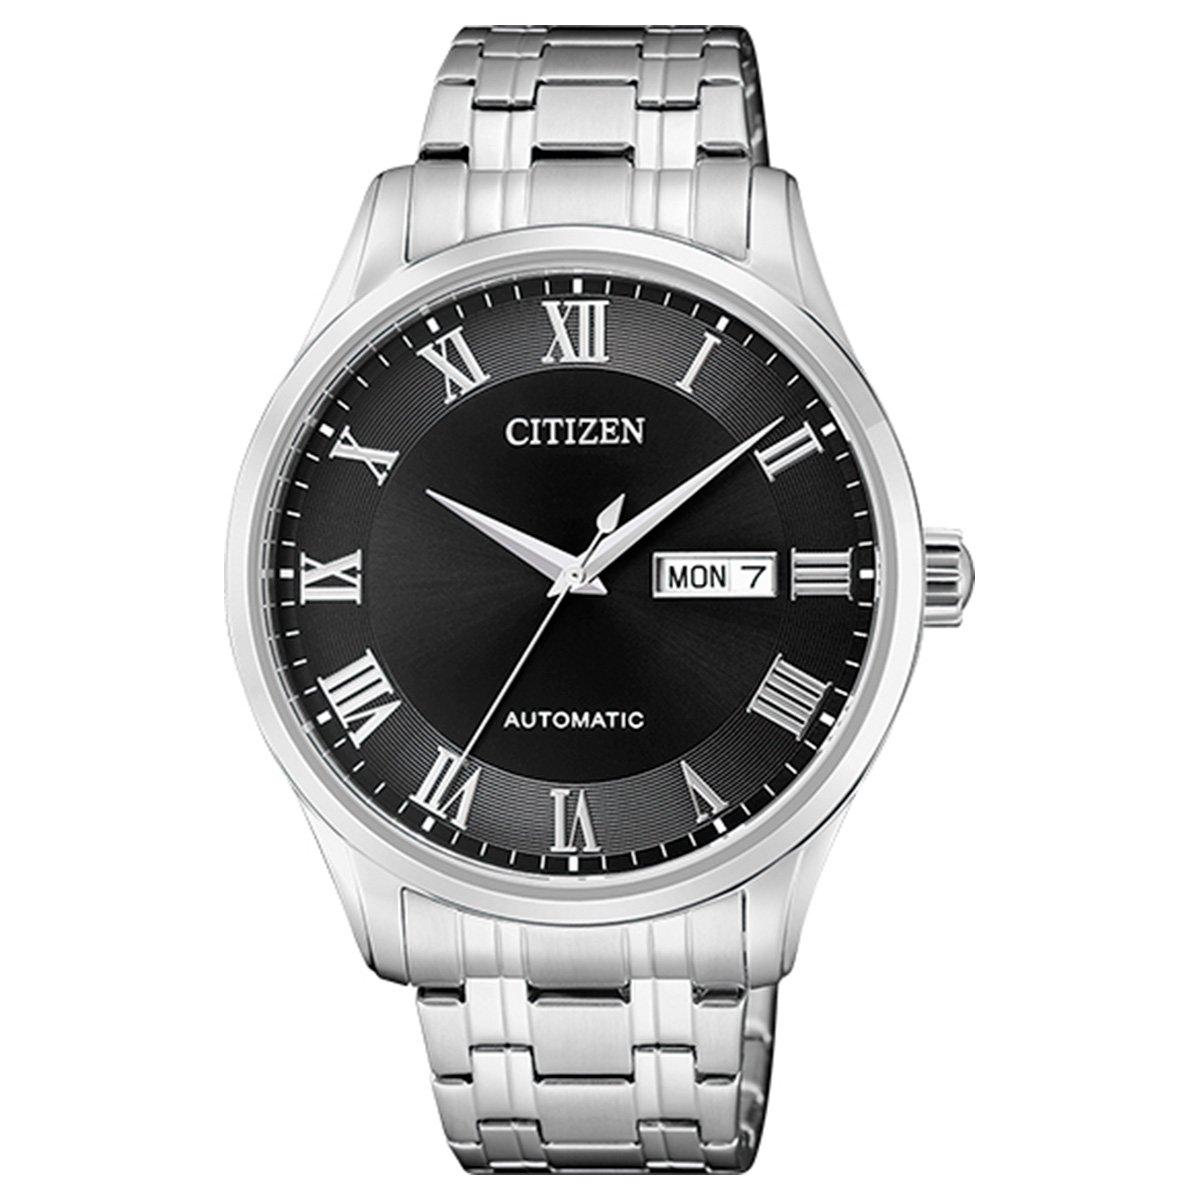 cab61930378 Relógio Citizen Analógico Automático TZ20797T Masculino